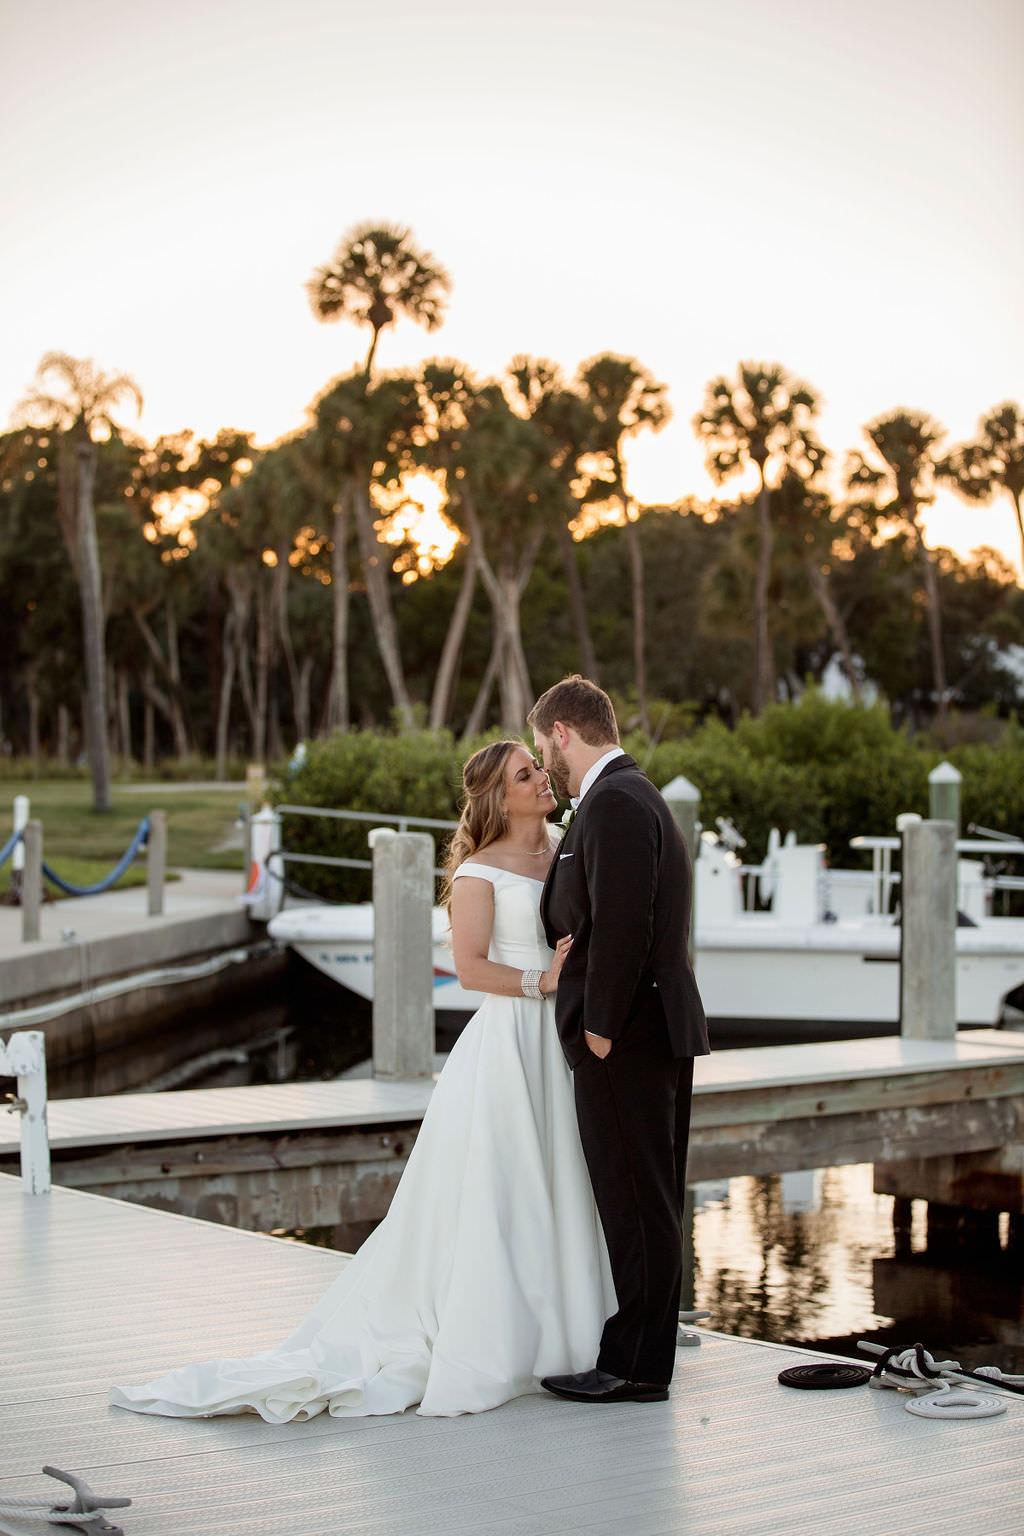 Florida Bride and Groom Boat Dock Sunset Waterfront Wedding Portrait   Waterfront Wedding Venue The Resort at Longboat Key Club